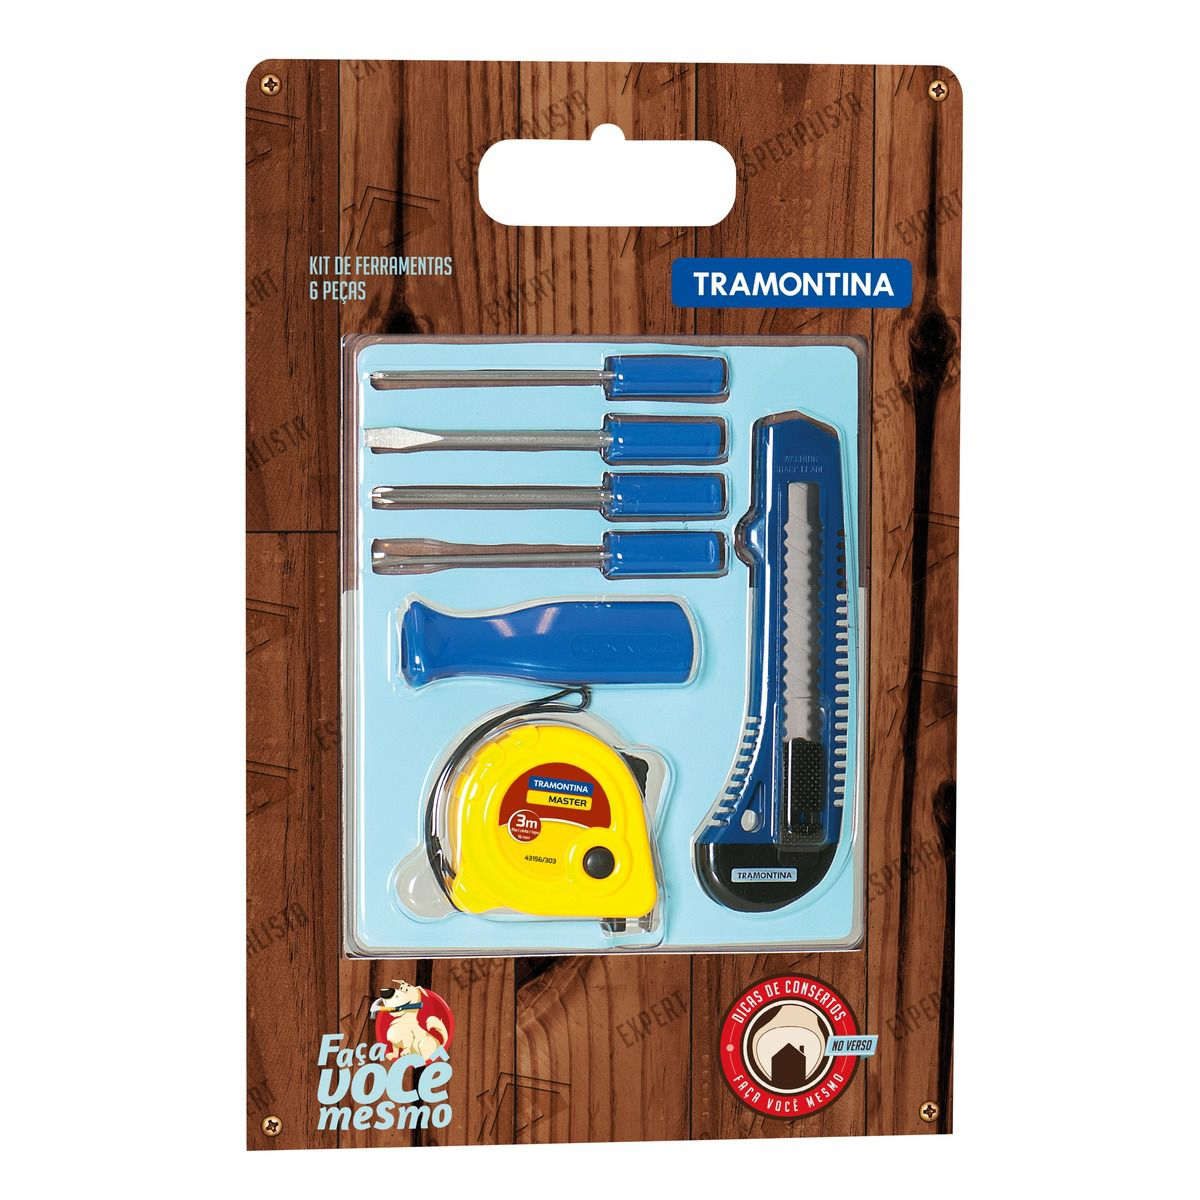 Kit de Ferramentas 6 Peças - Tramontina